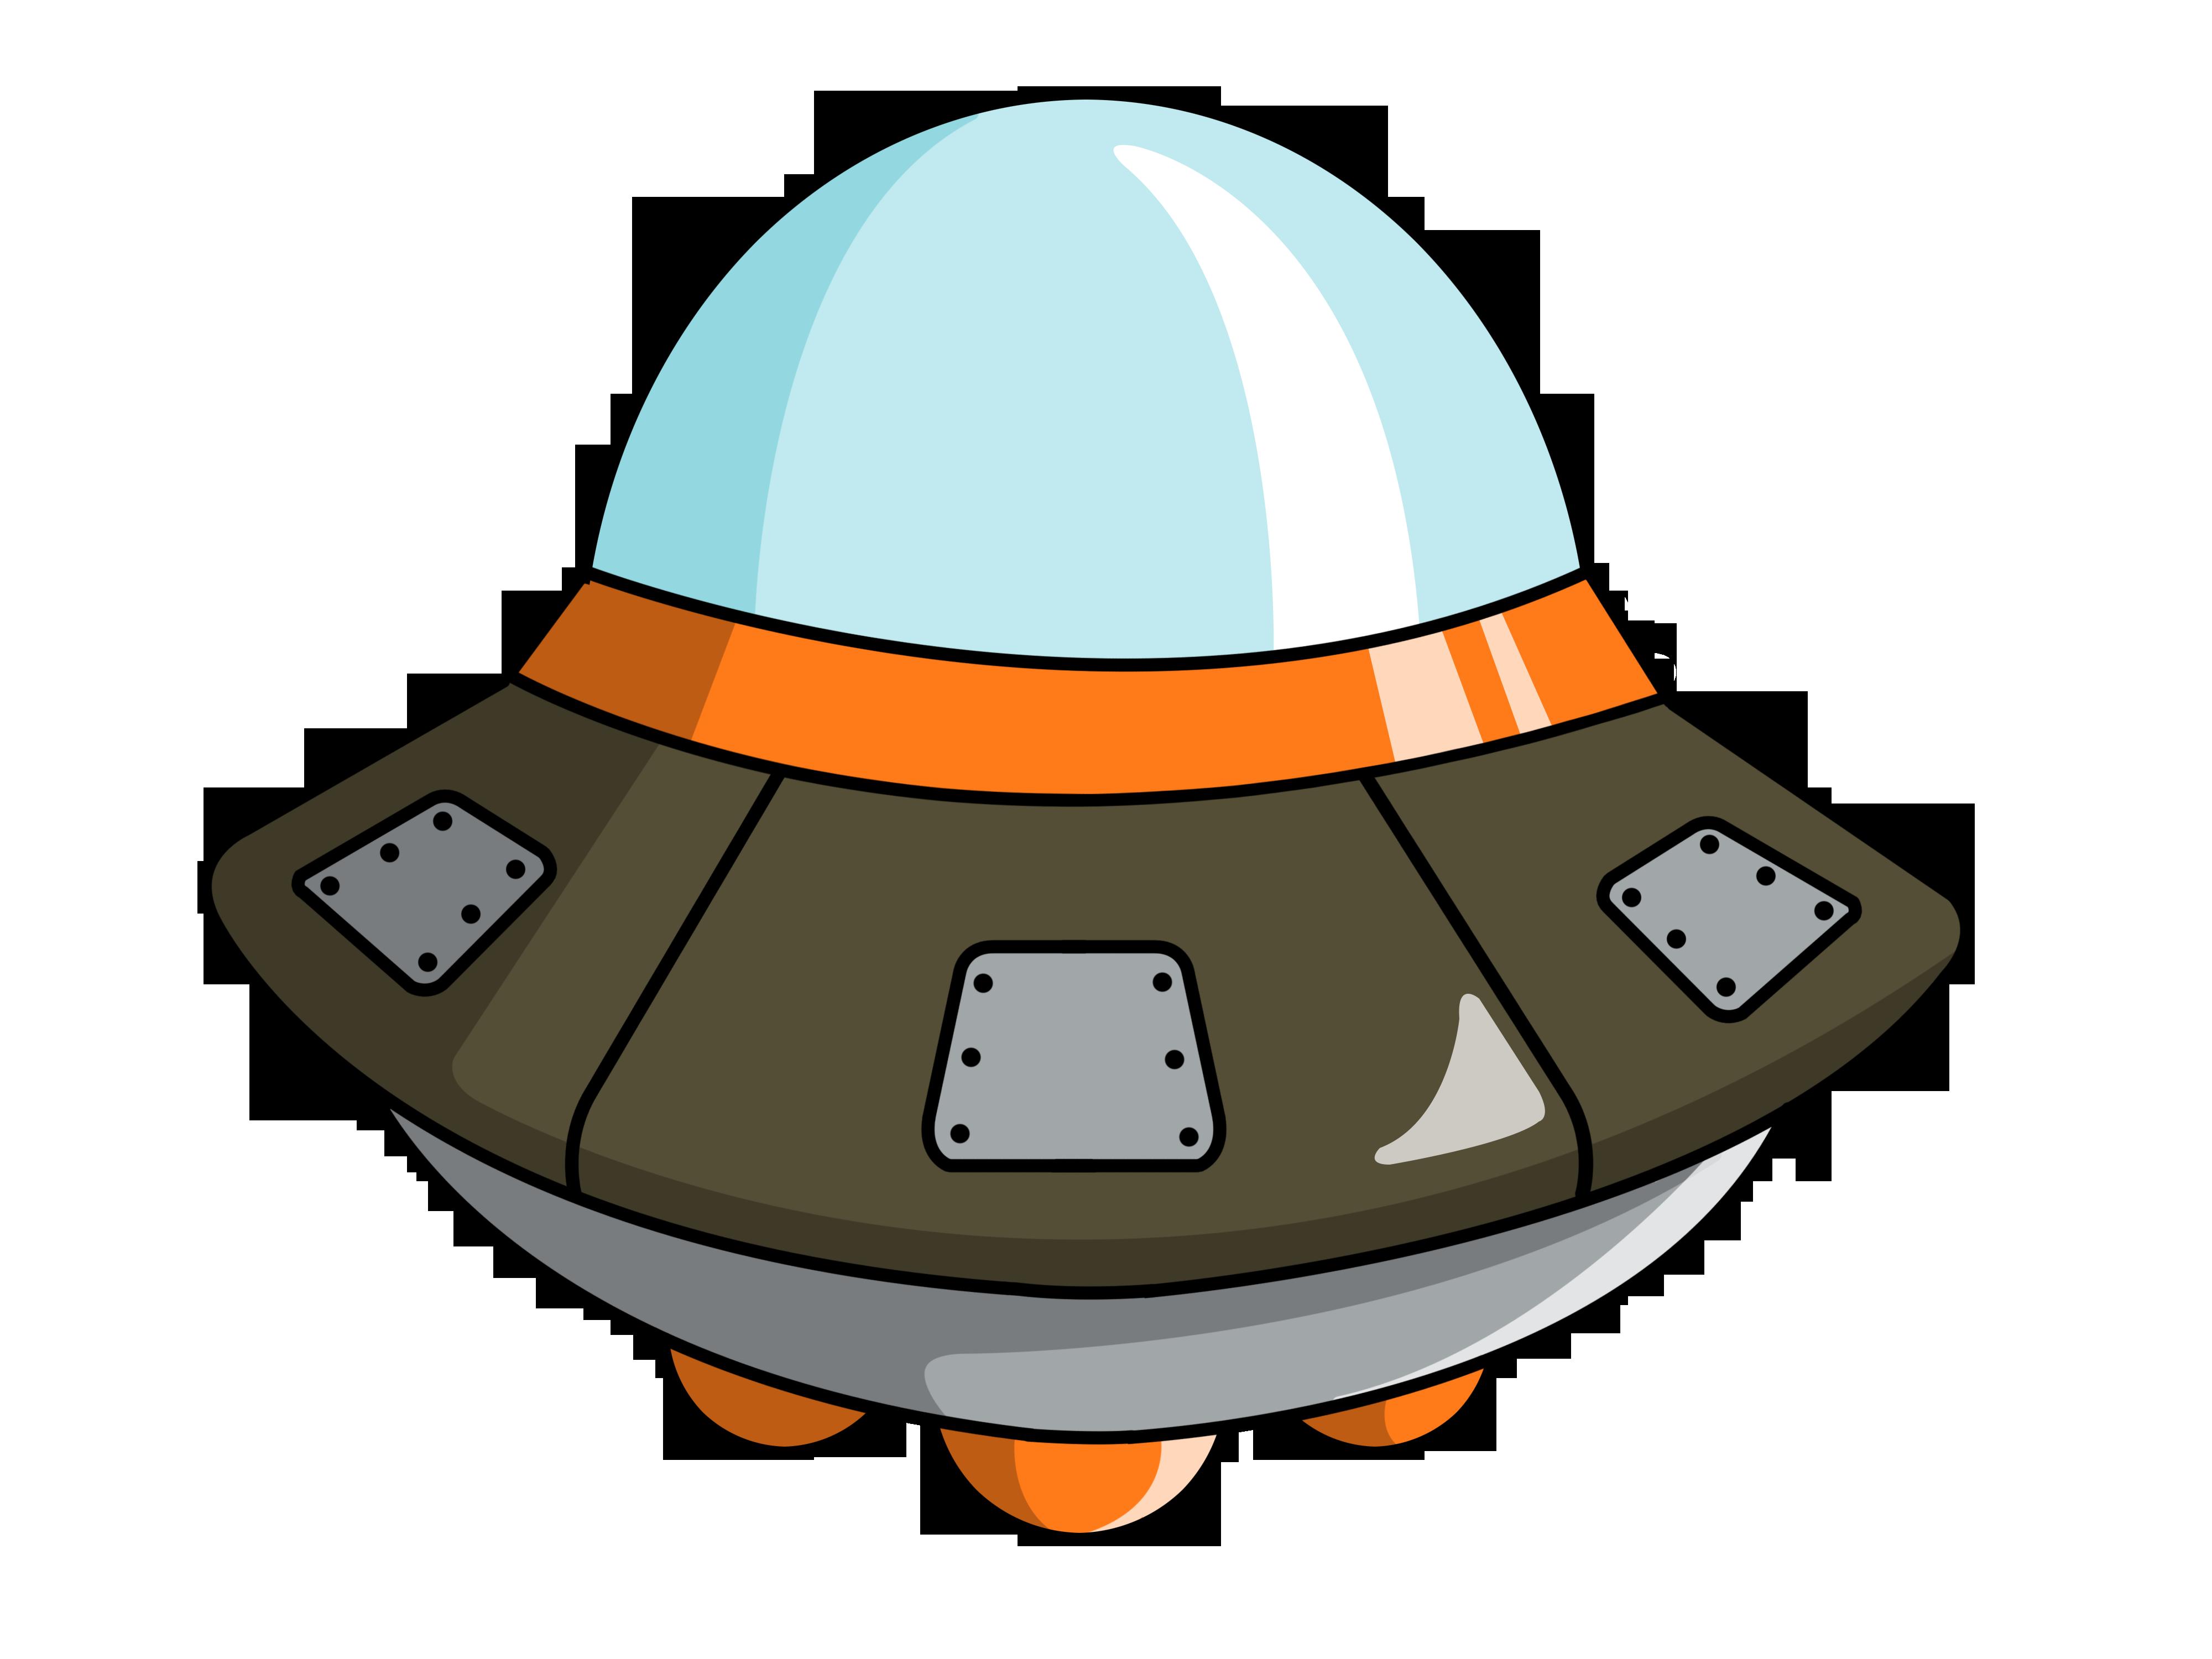 Cute Spaceship Clipart 2-Cute spaceship clipart 2-6